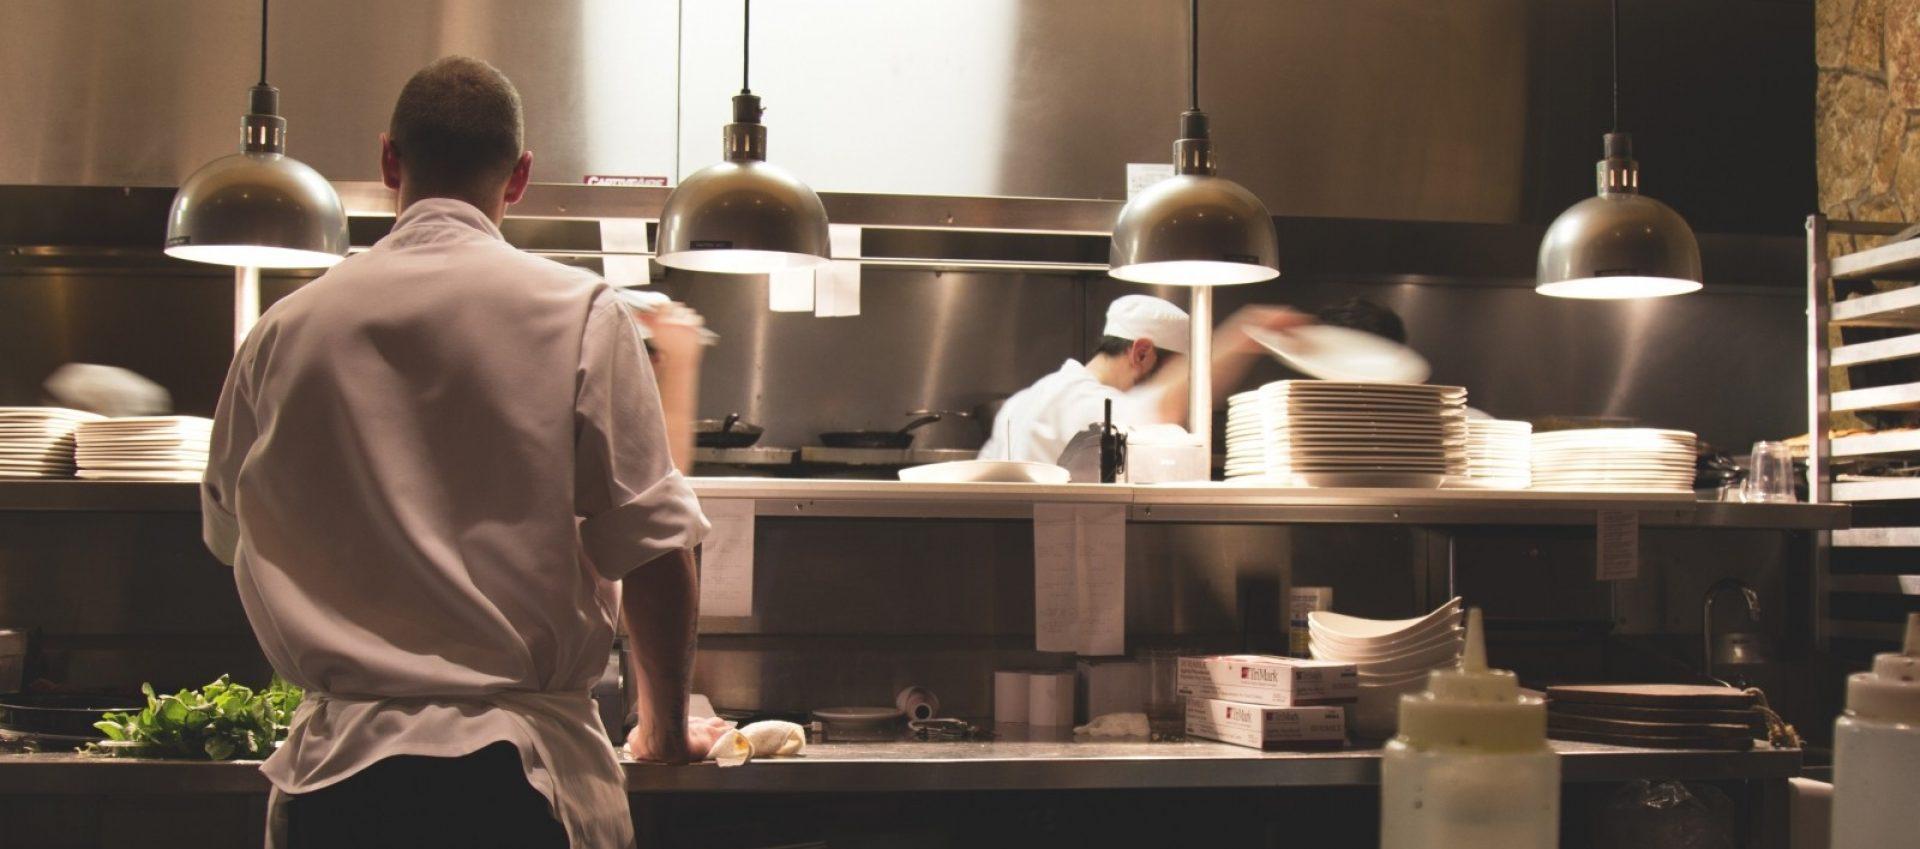 facturation restaurant